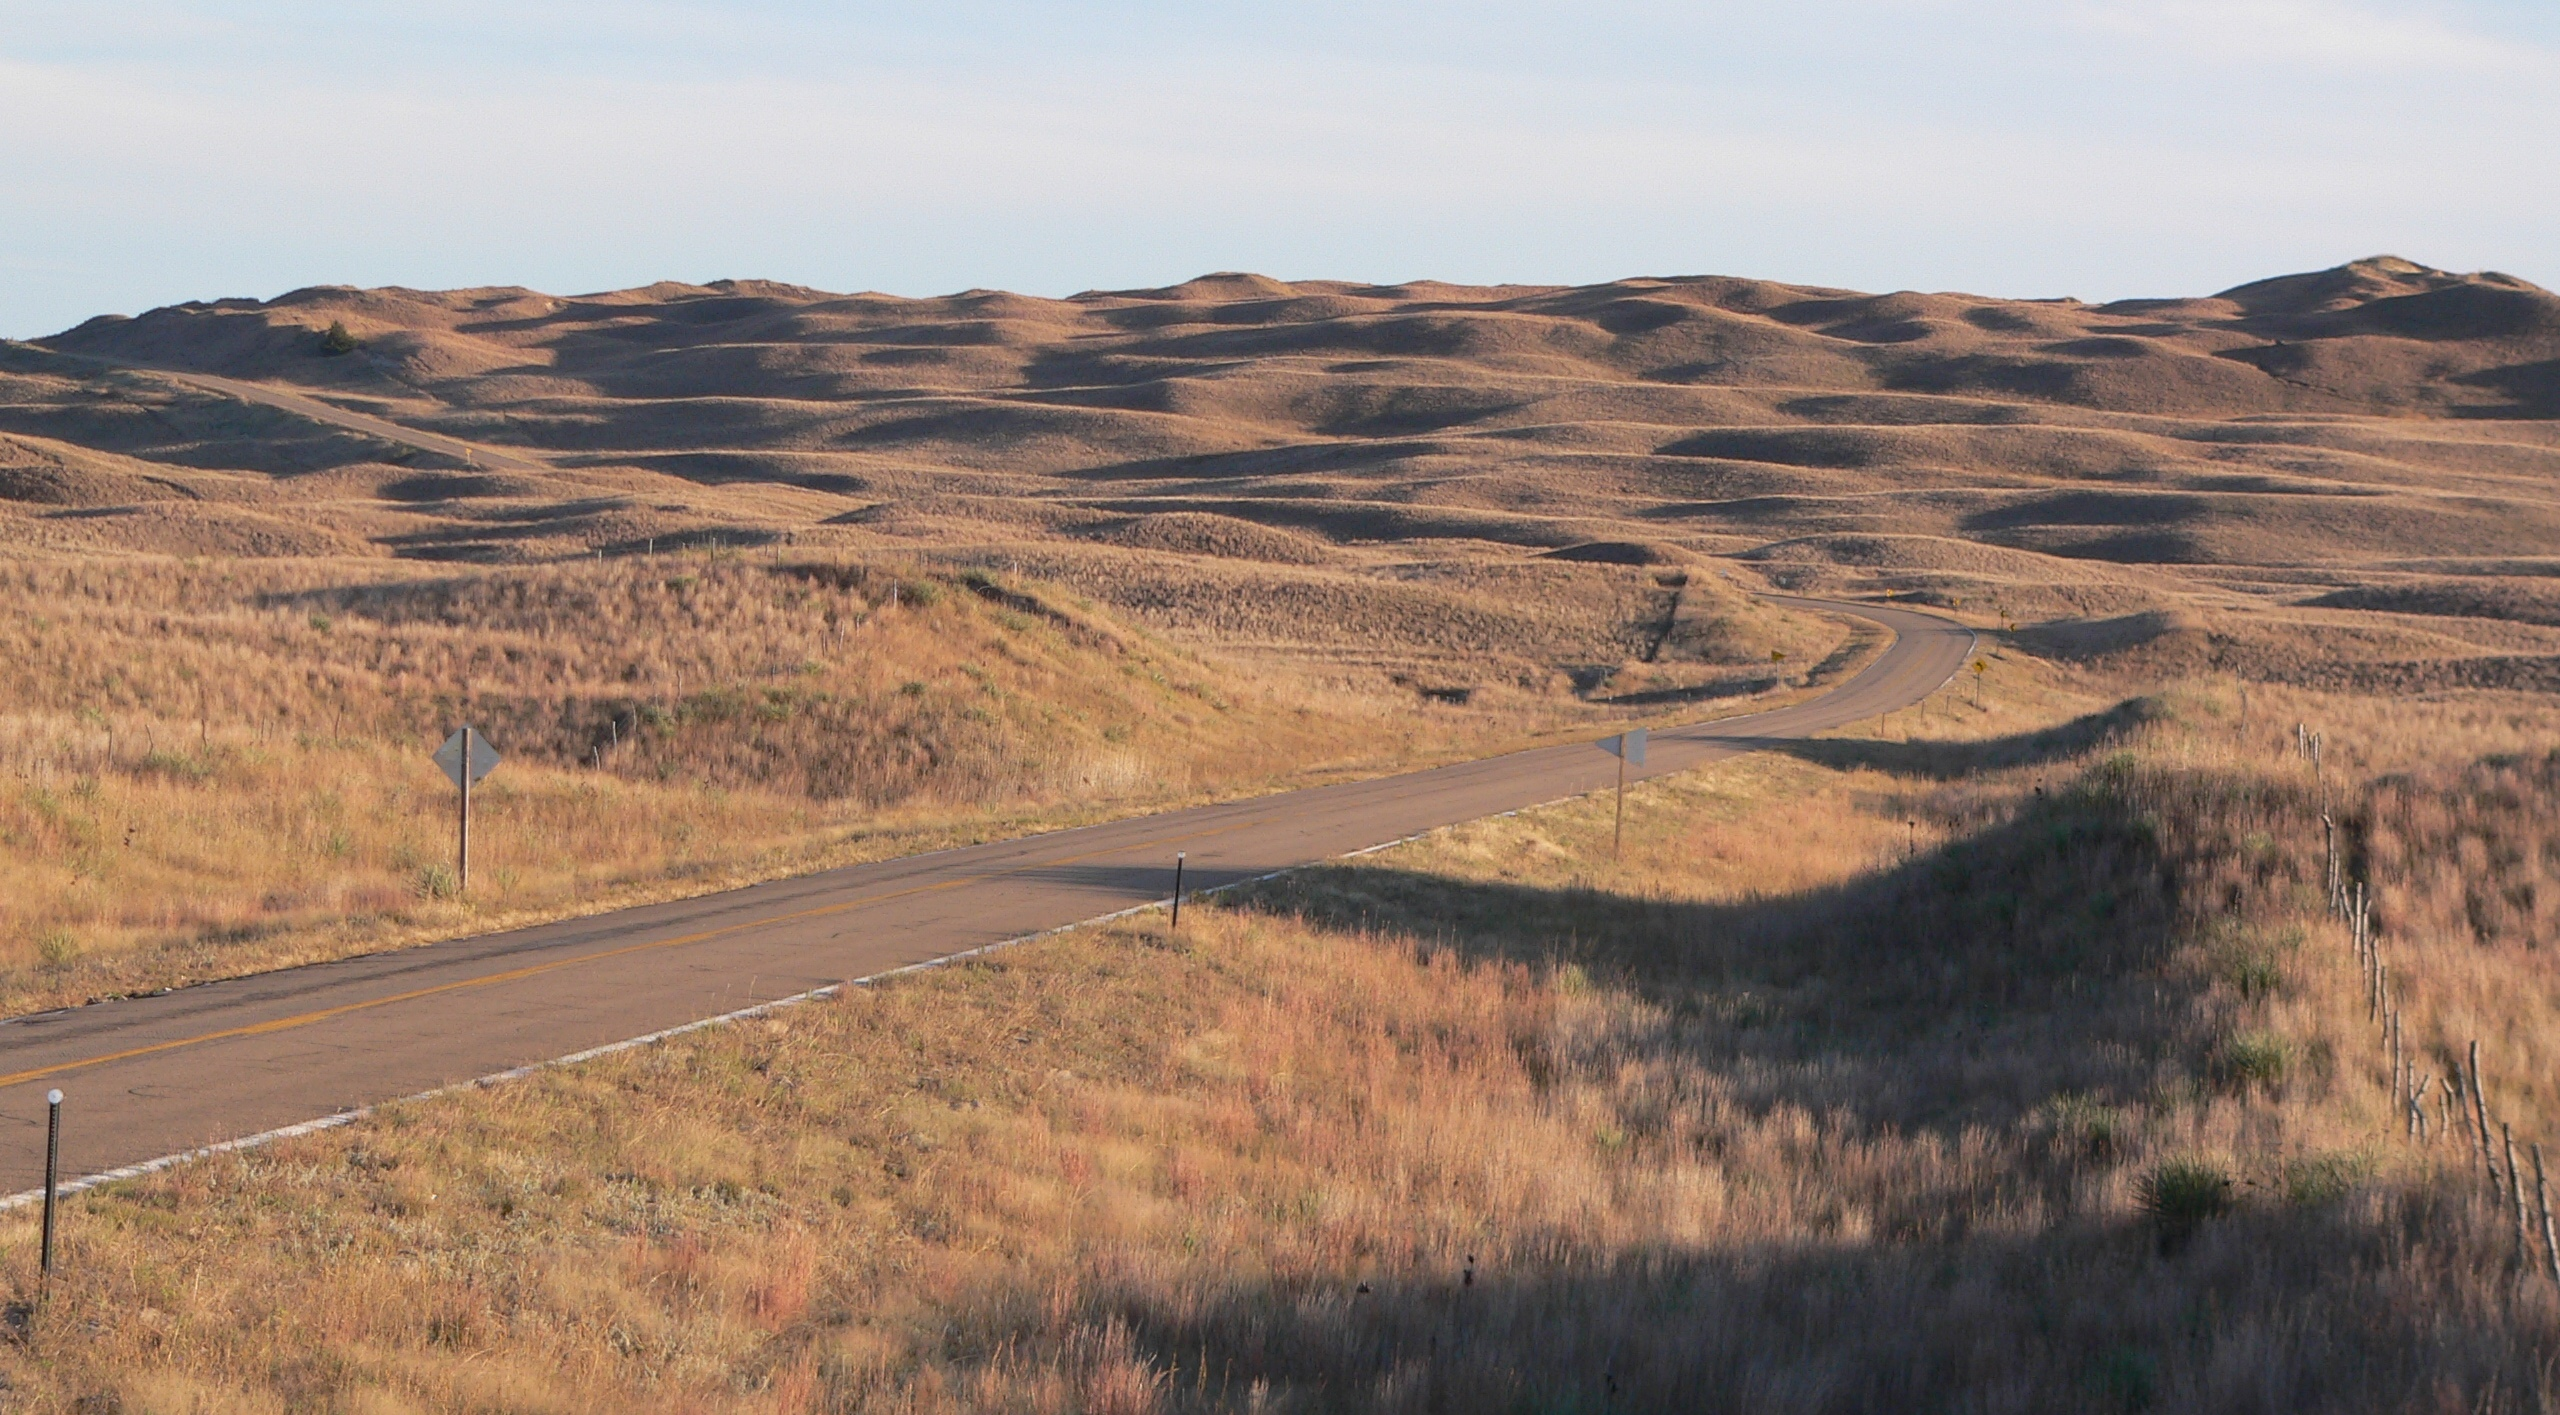 Lewellen Nebraska And The Nearby Sandhills 171 A Landing